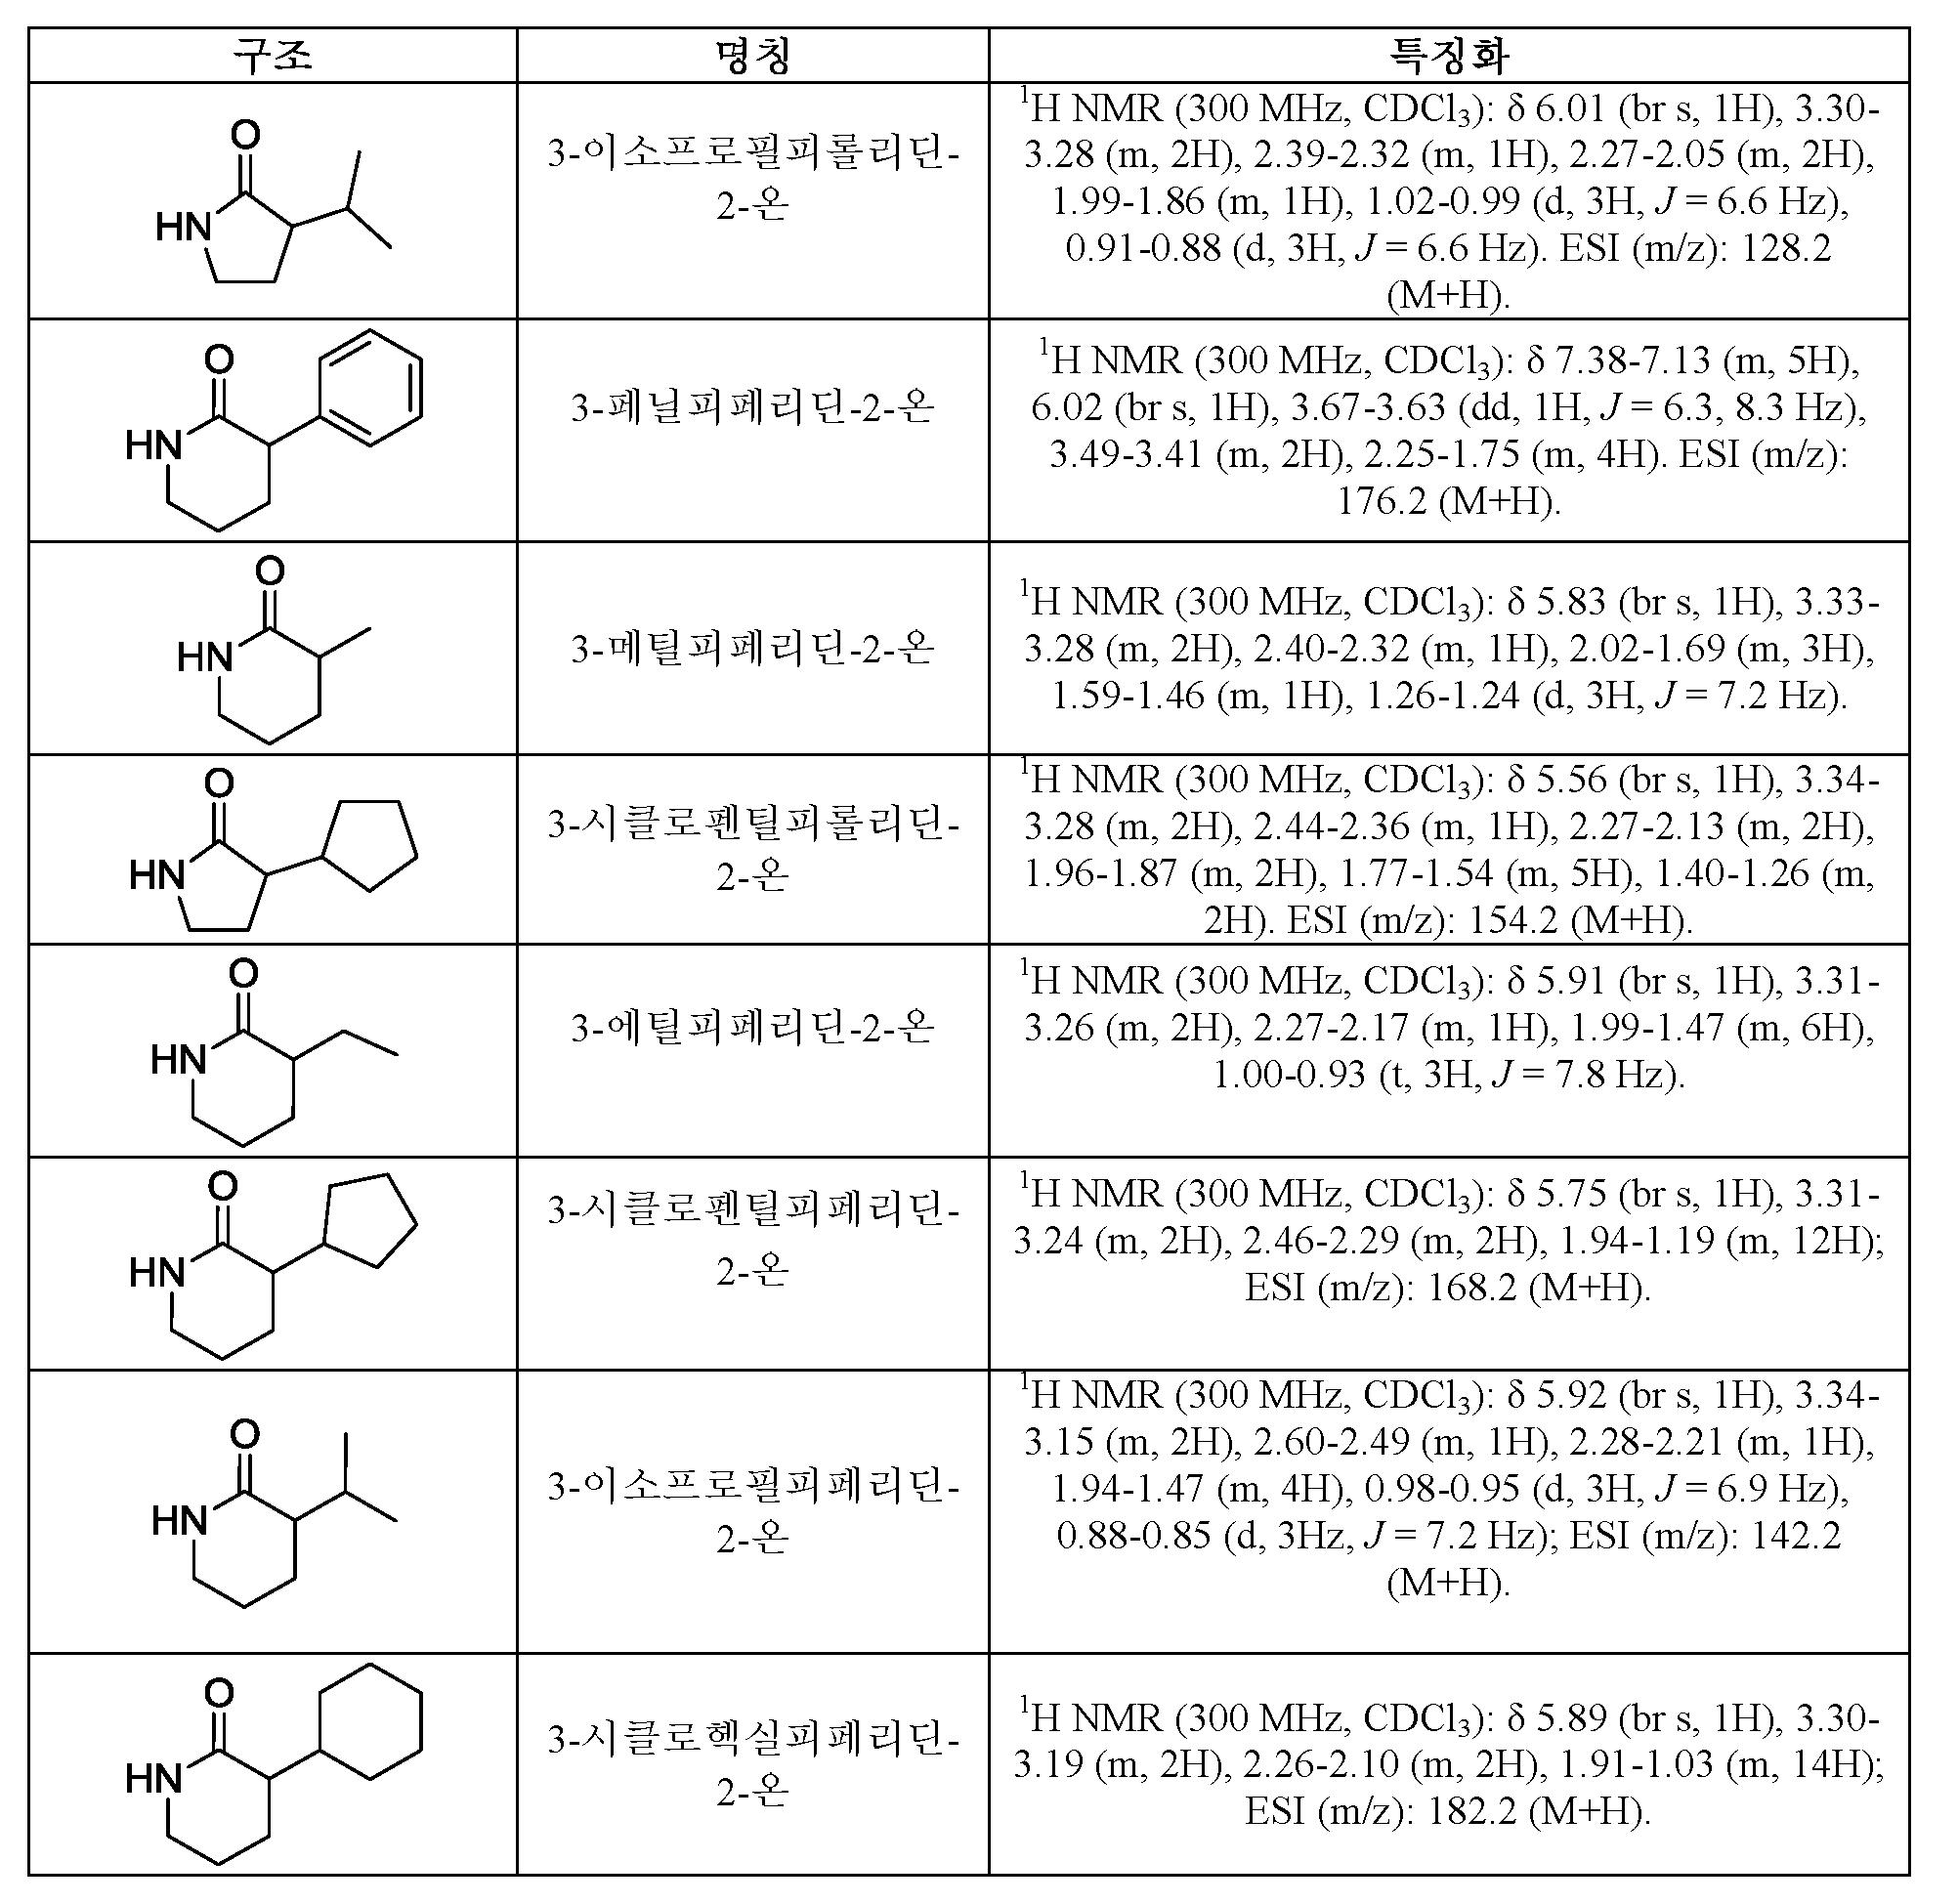 KR20160140909A - Carbazole-containing amides, carbamates